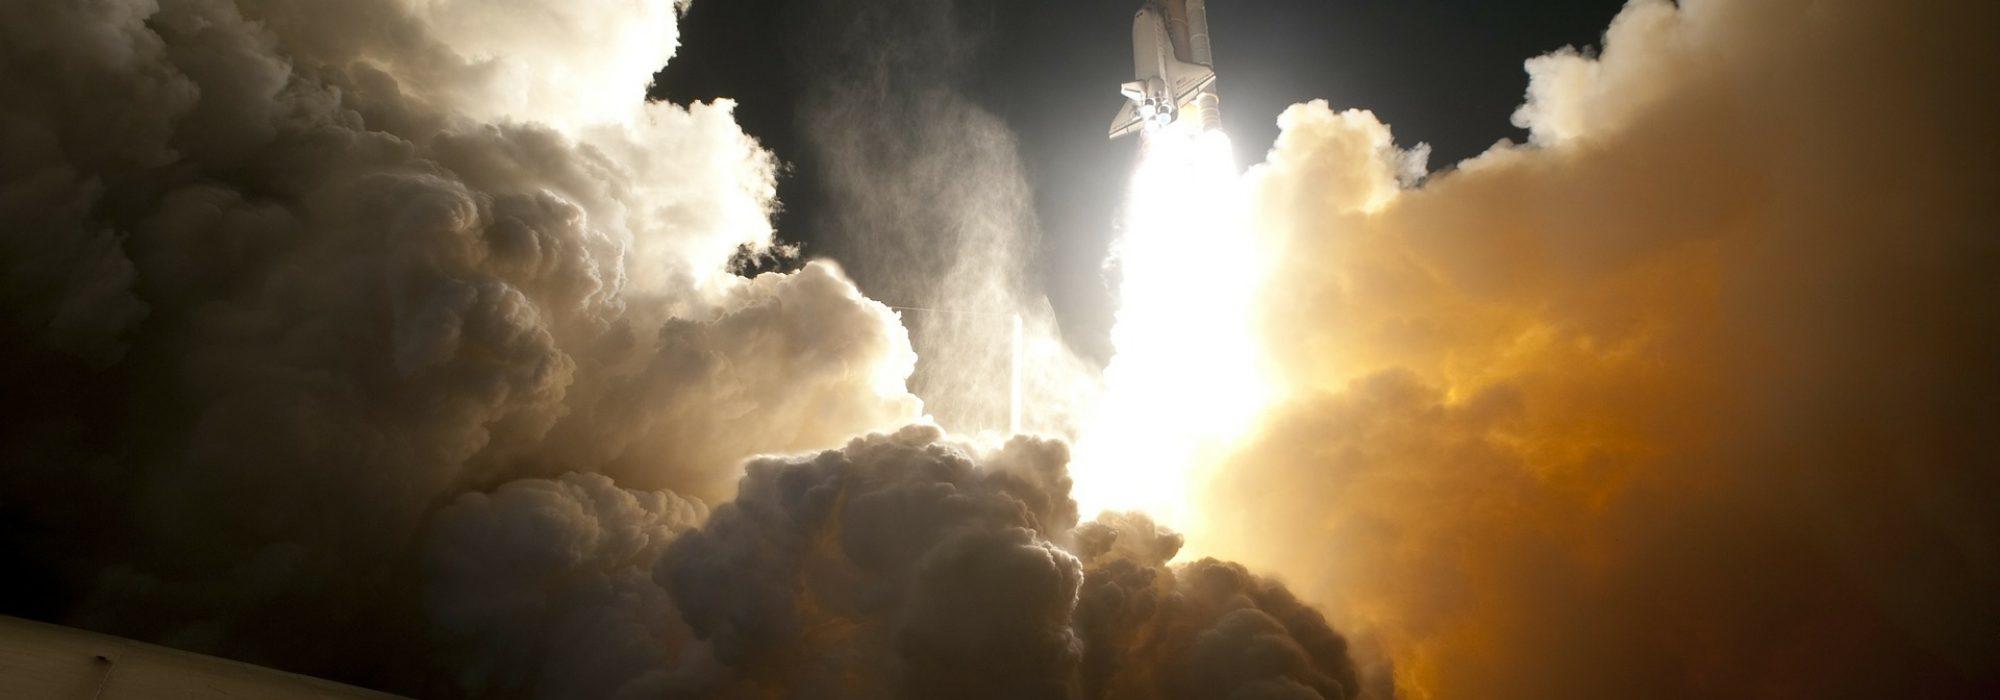 rocket-launch-67646_1920